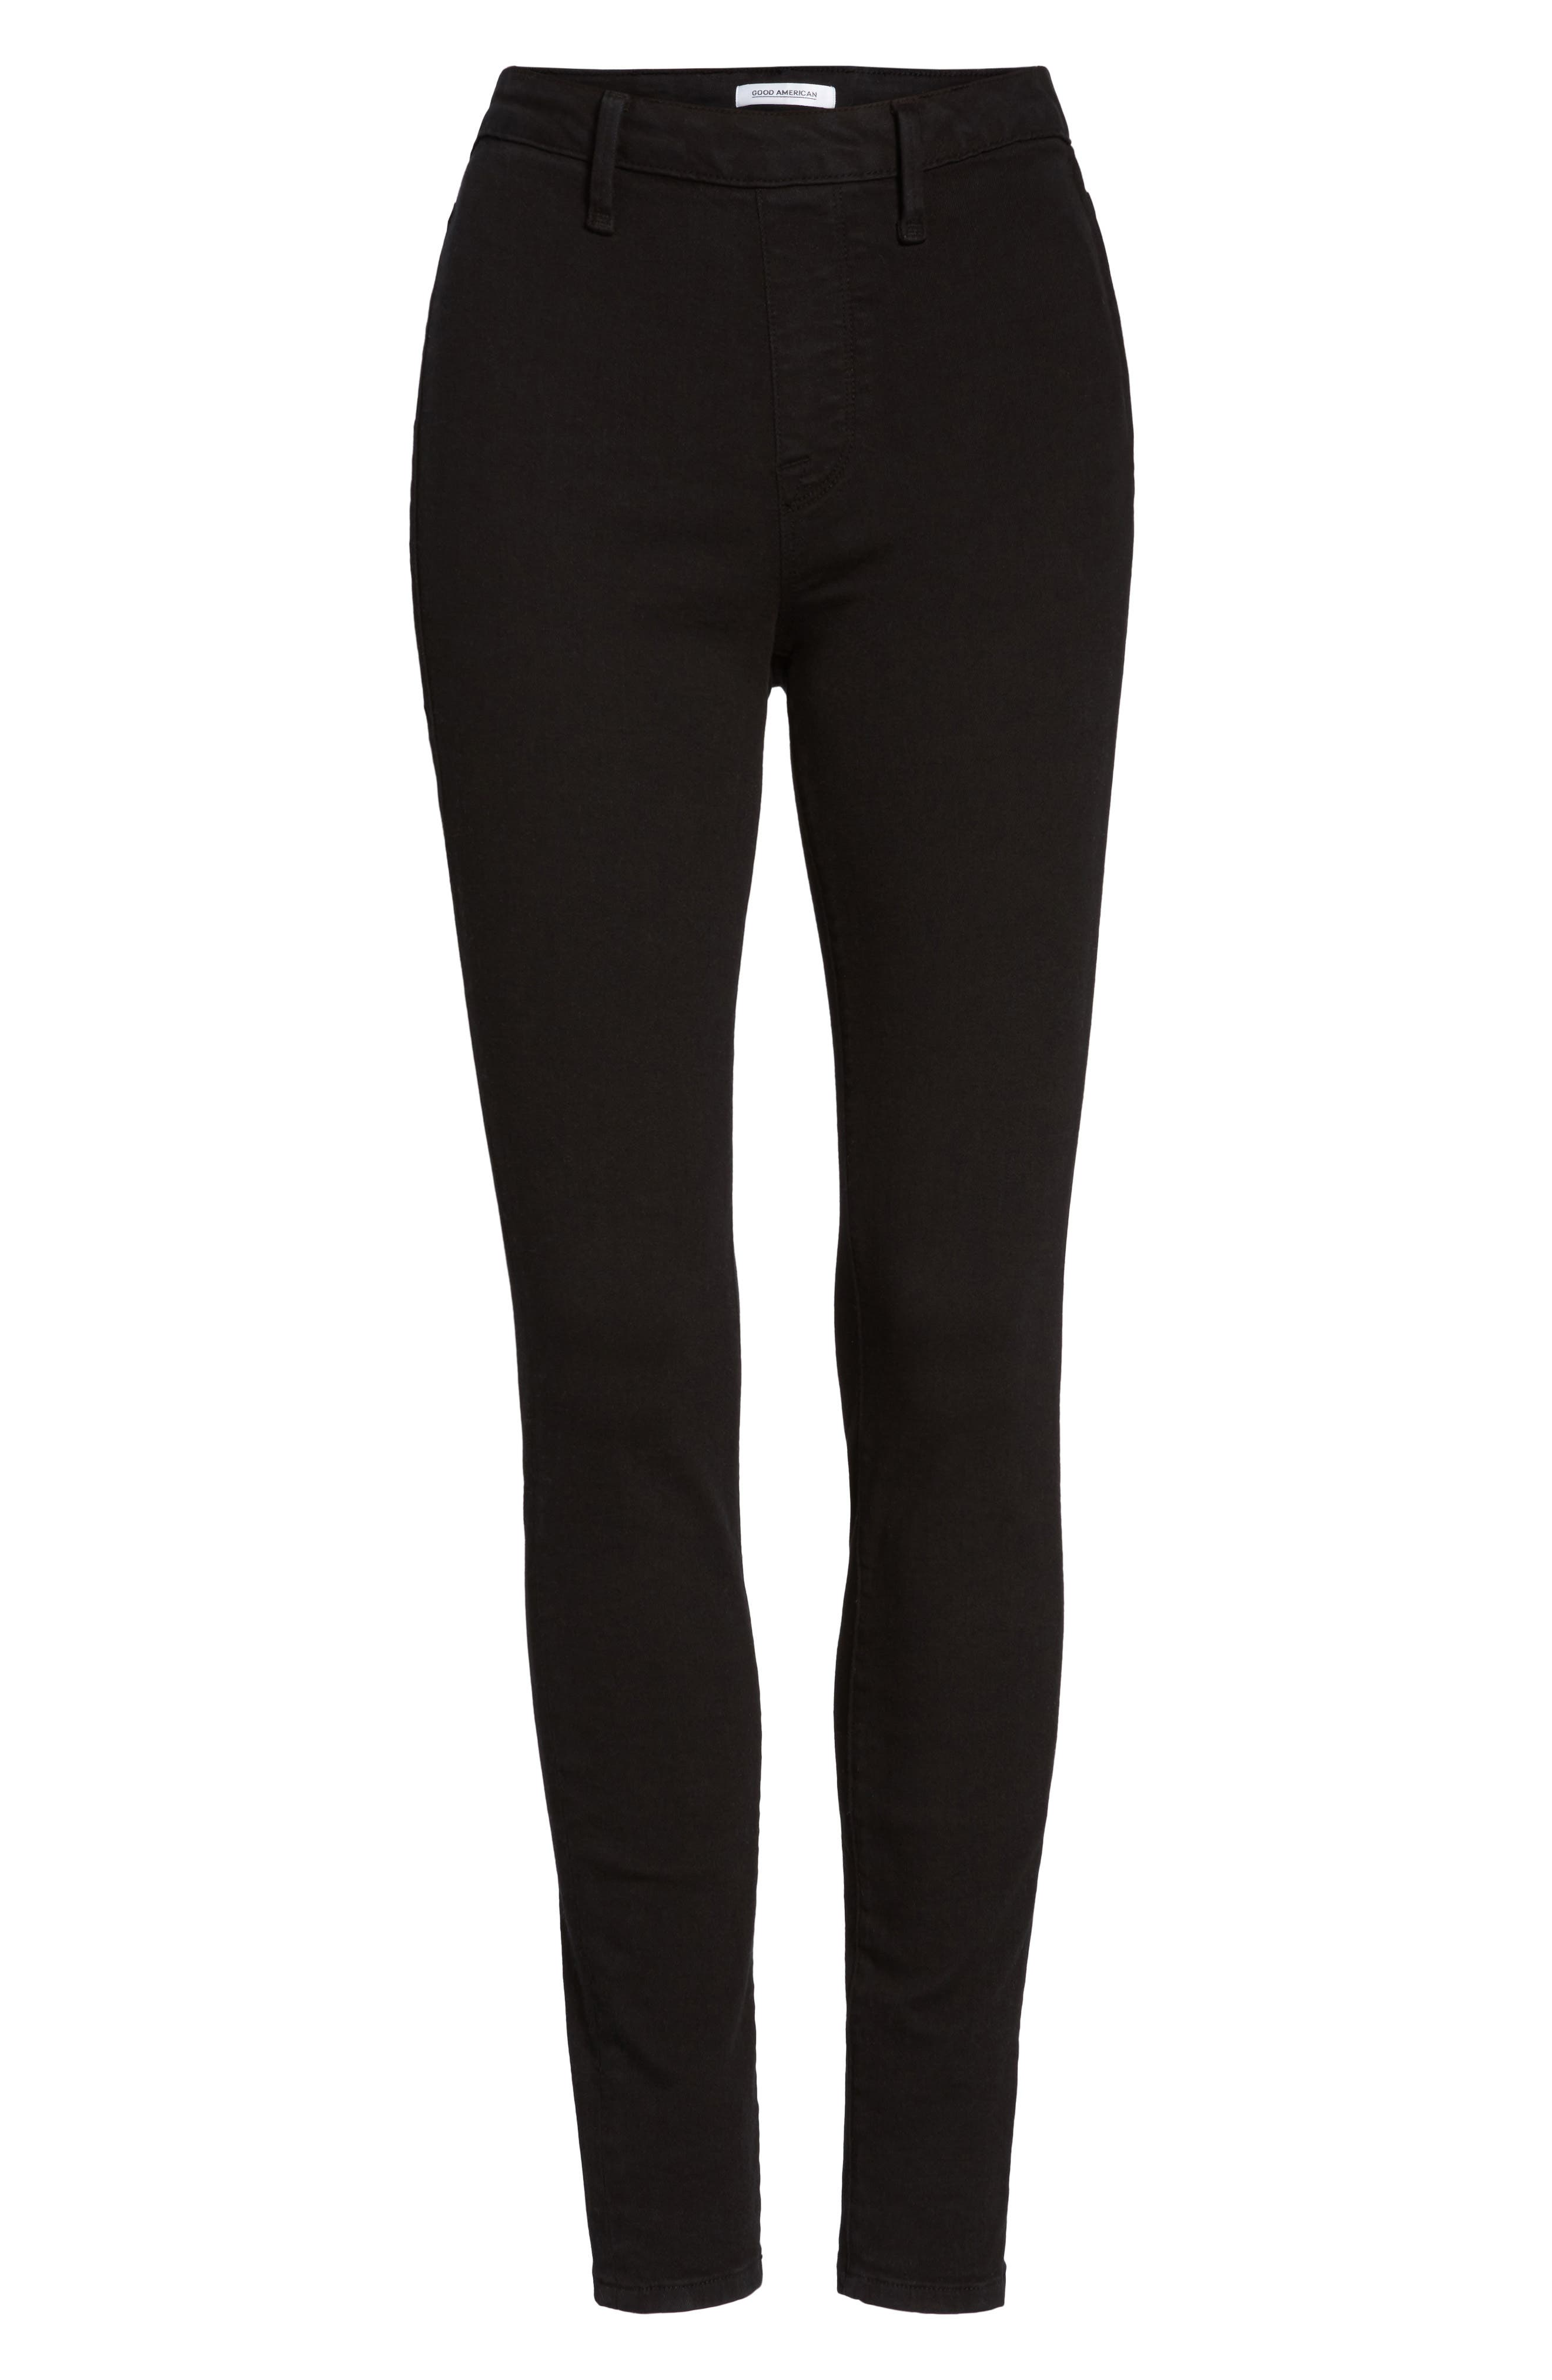 High Waist Side Zip Skinny Jeans,                             Alternate thumbnail 6, color,                             Black001